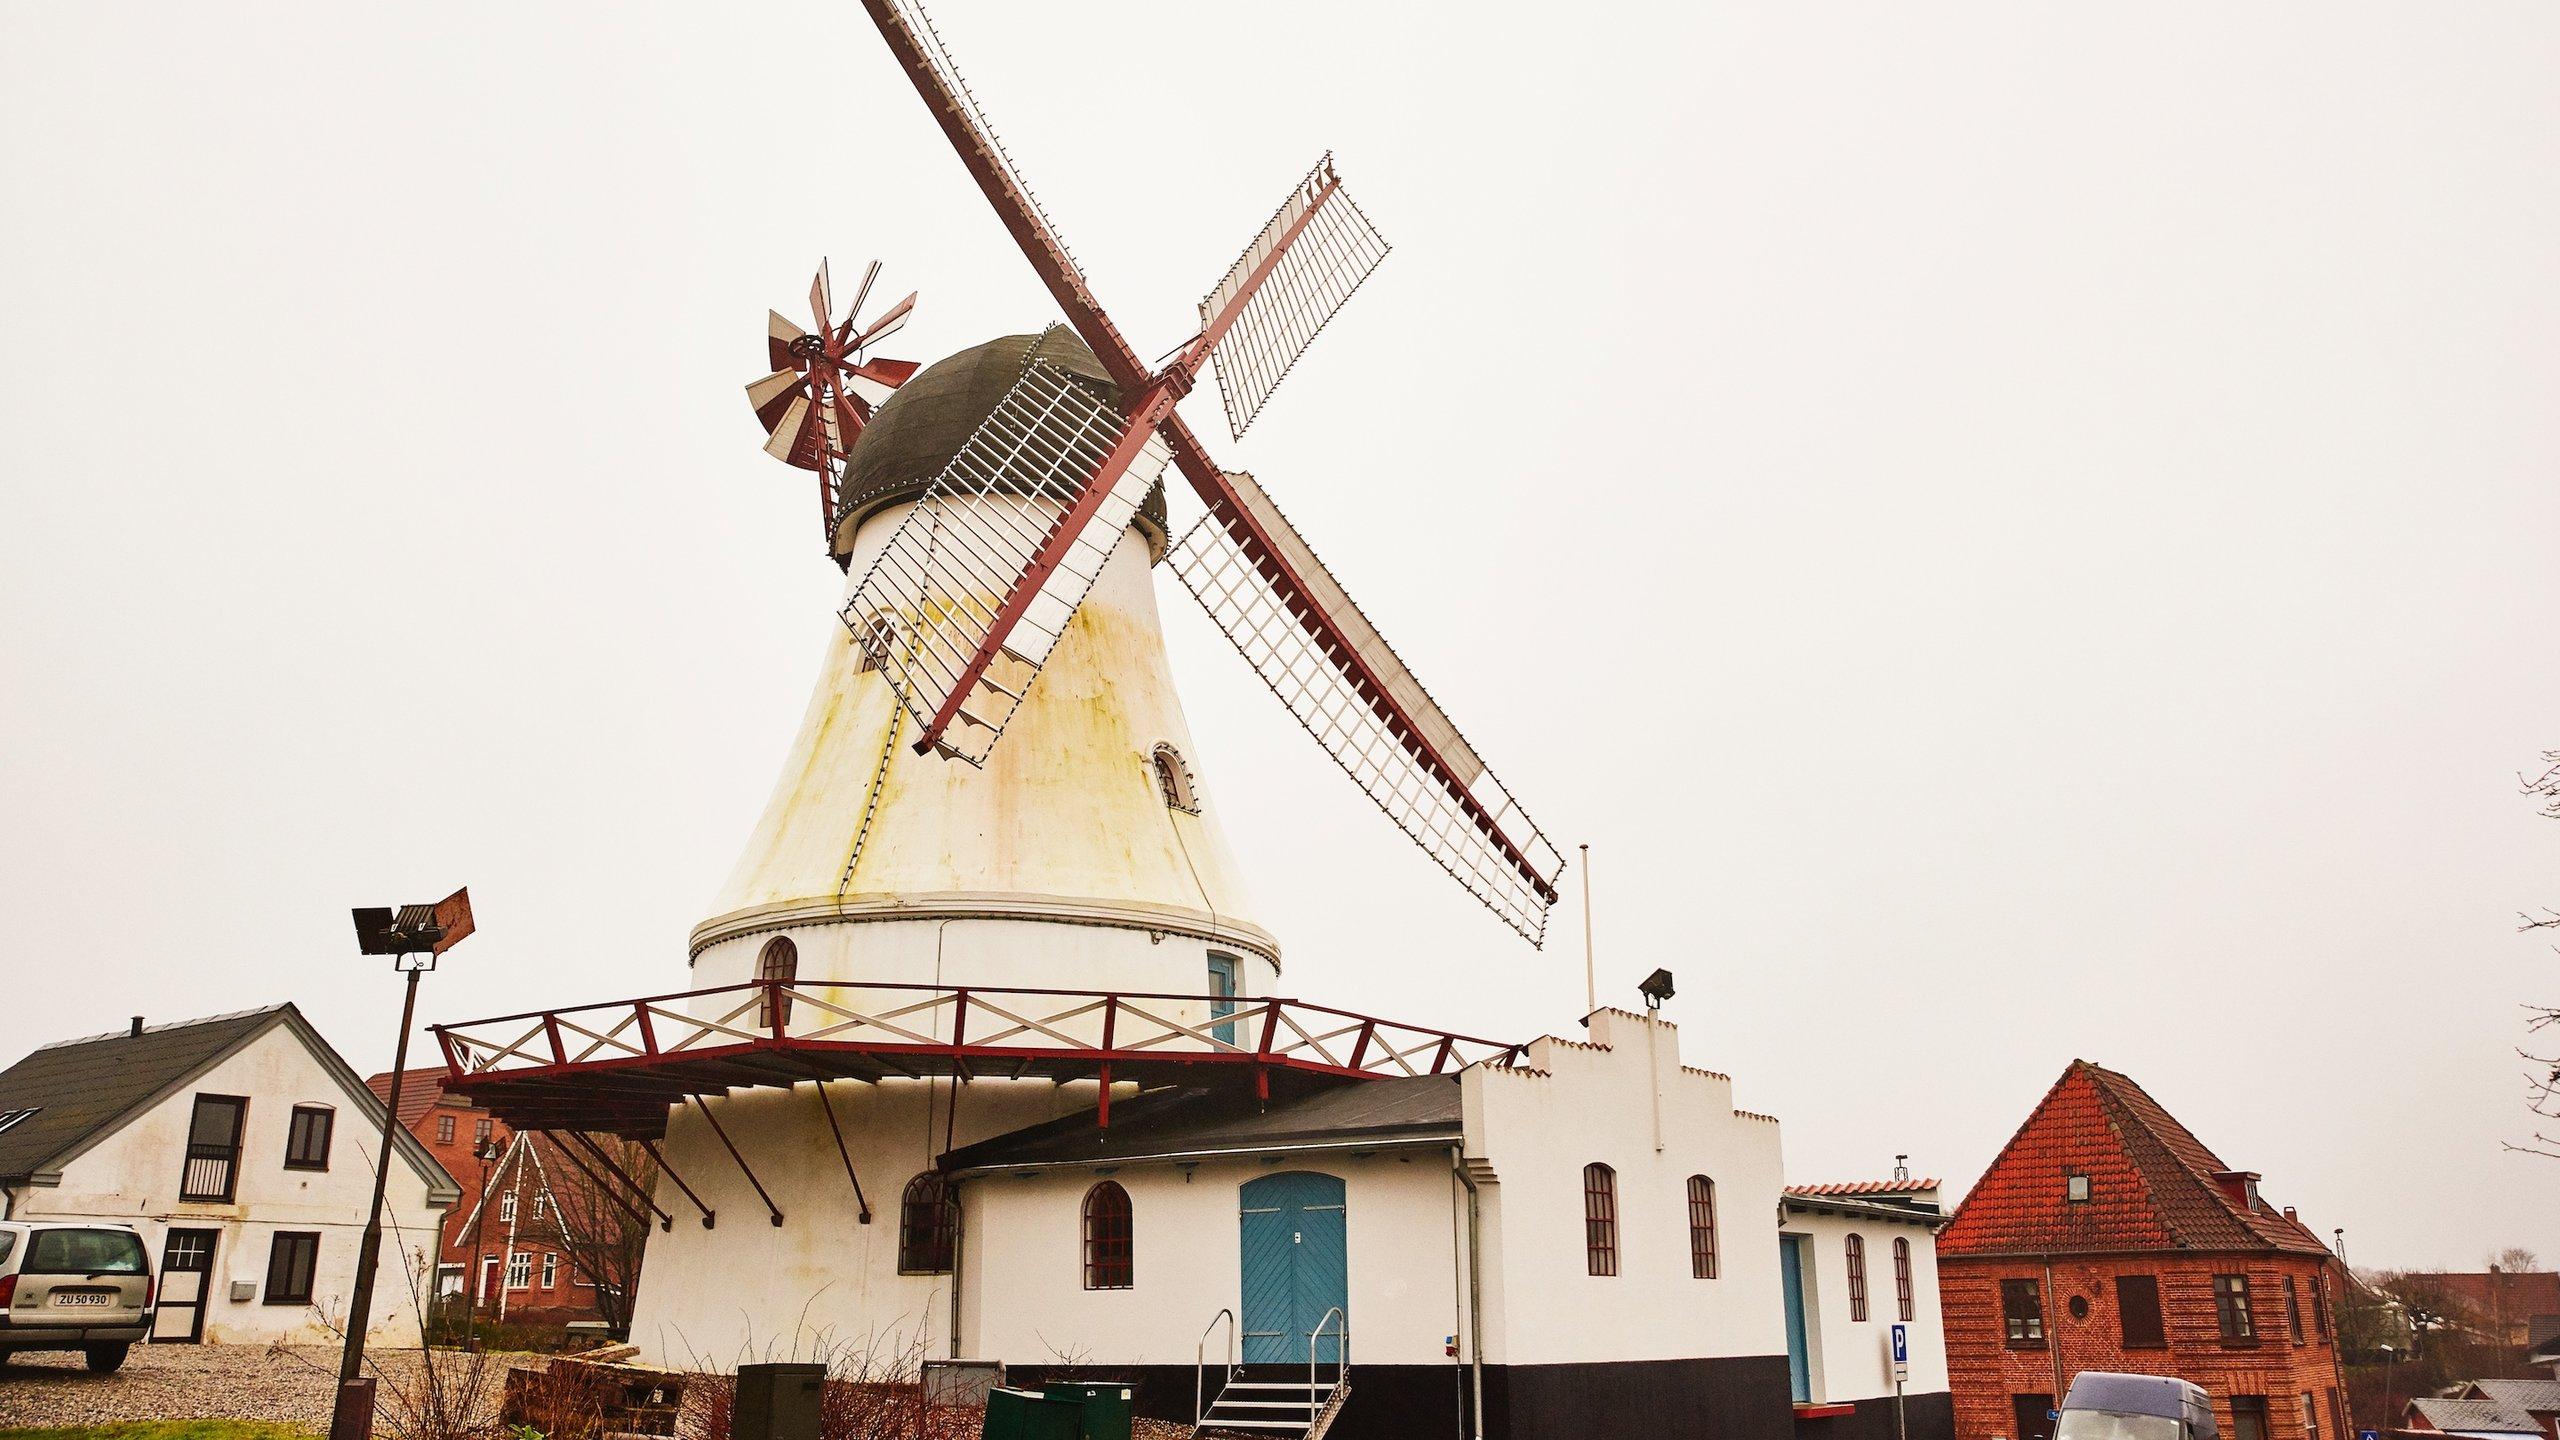 Vejle, Syddanmark, Denmark